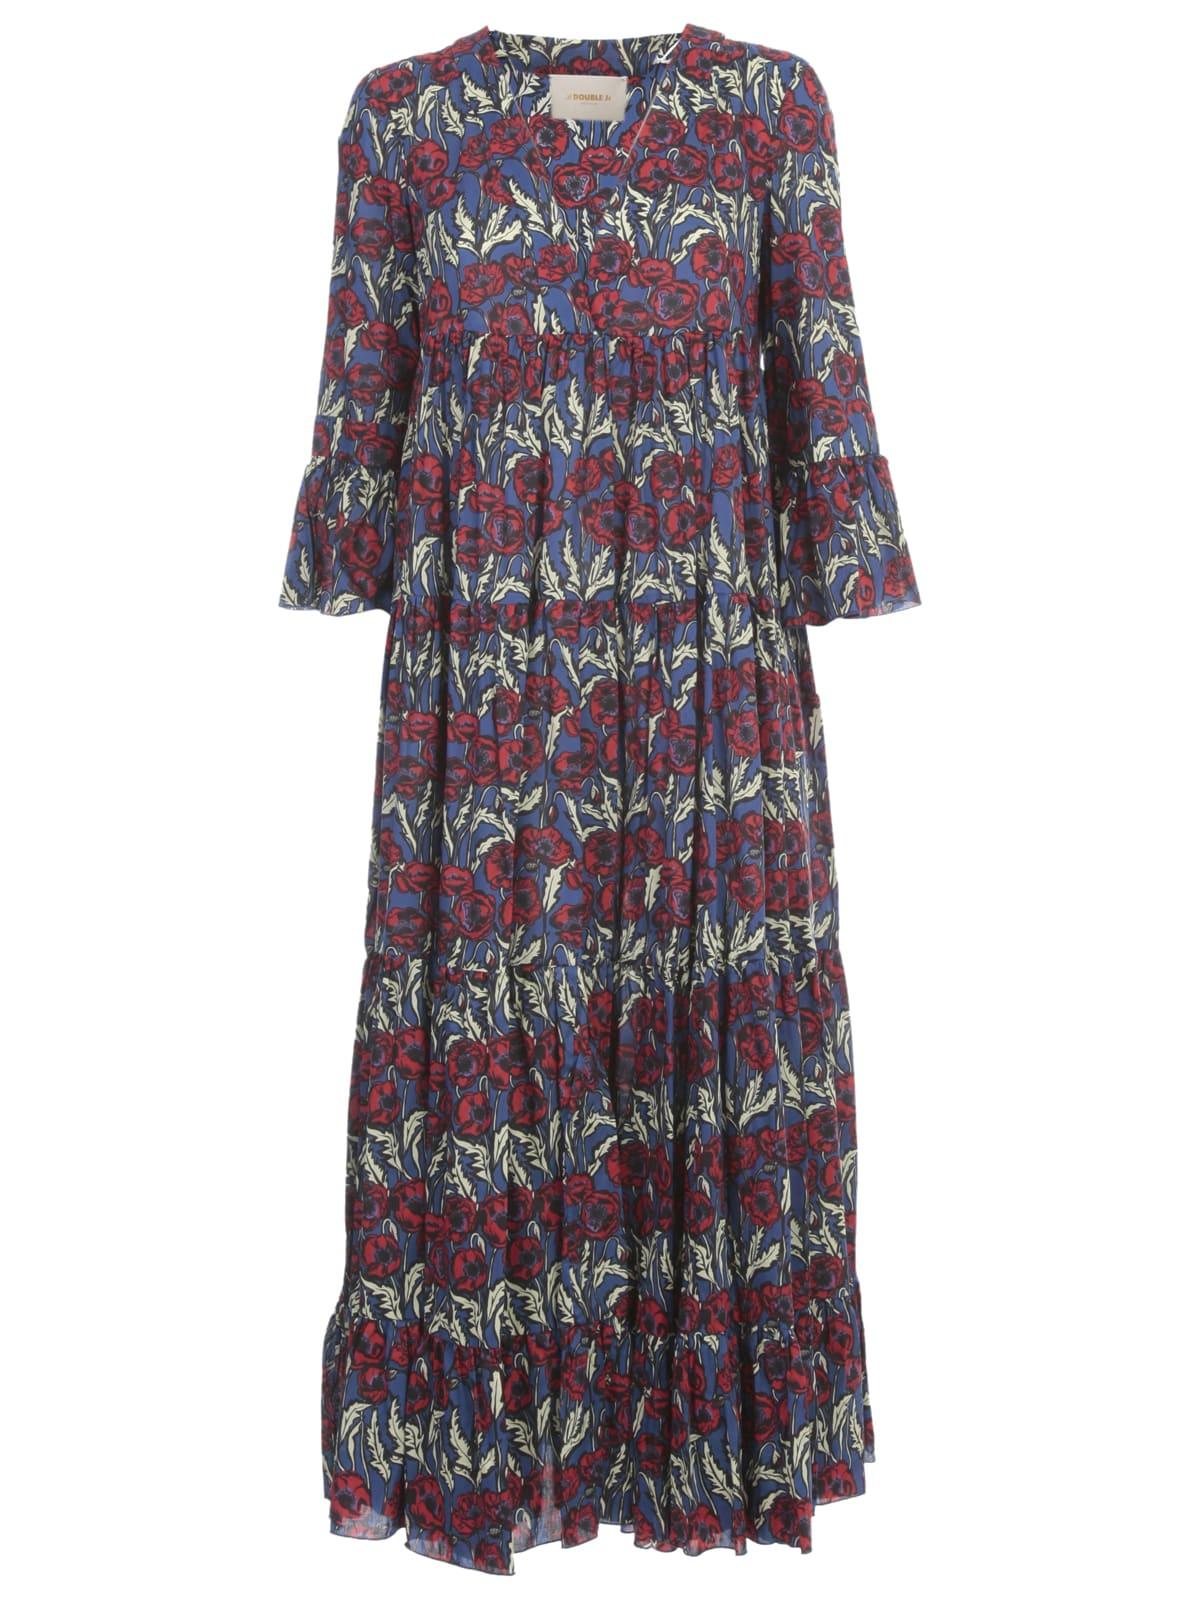 Buy La DoubleJ Jennifer Jane Maxi Dress 3/4s V Neck Blooms Fantasy W/fluonce online, shop La DoubleJ with free shipping